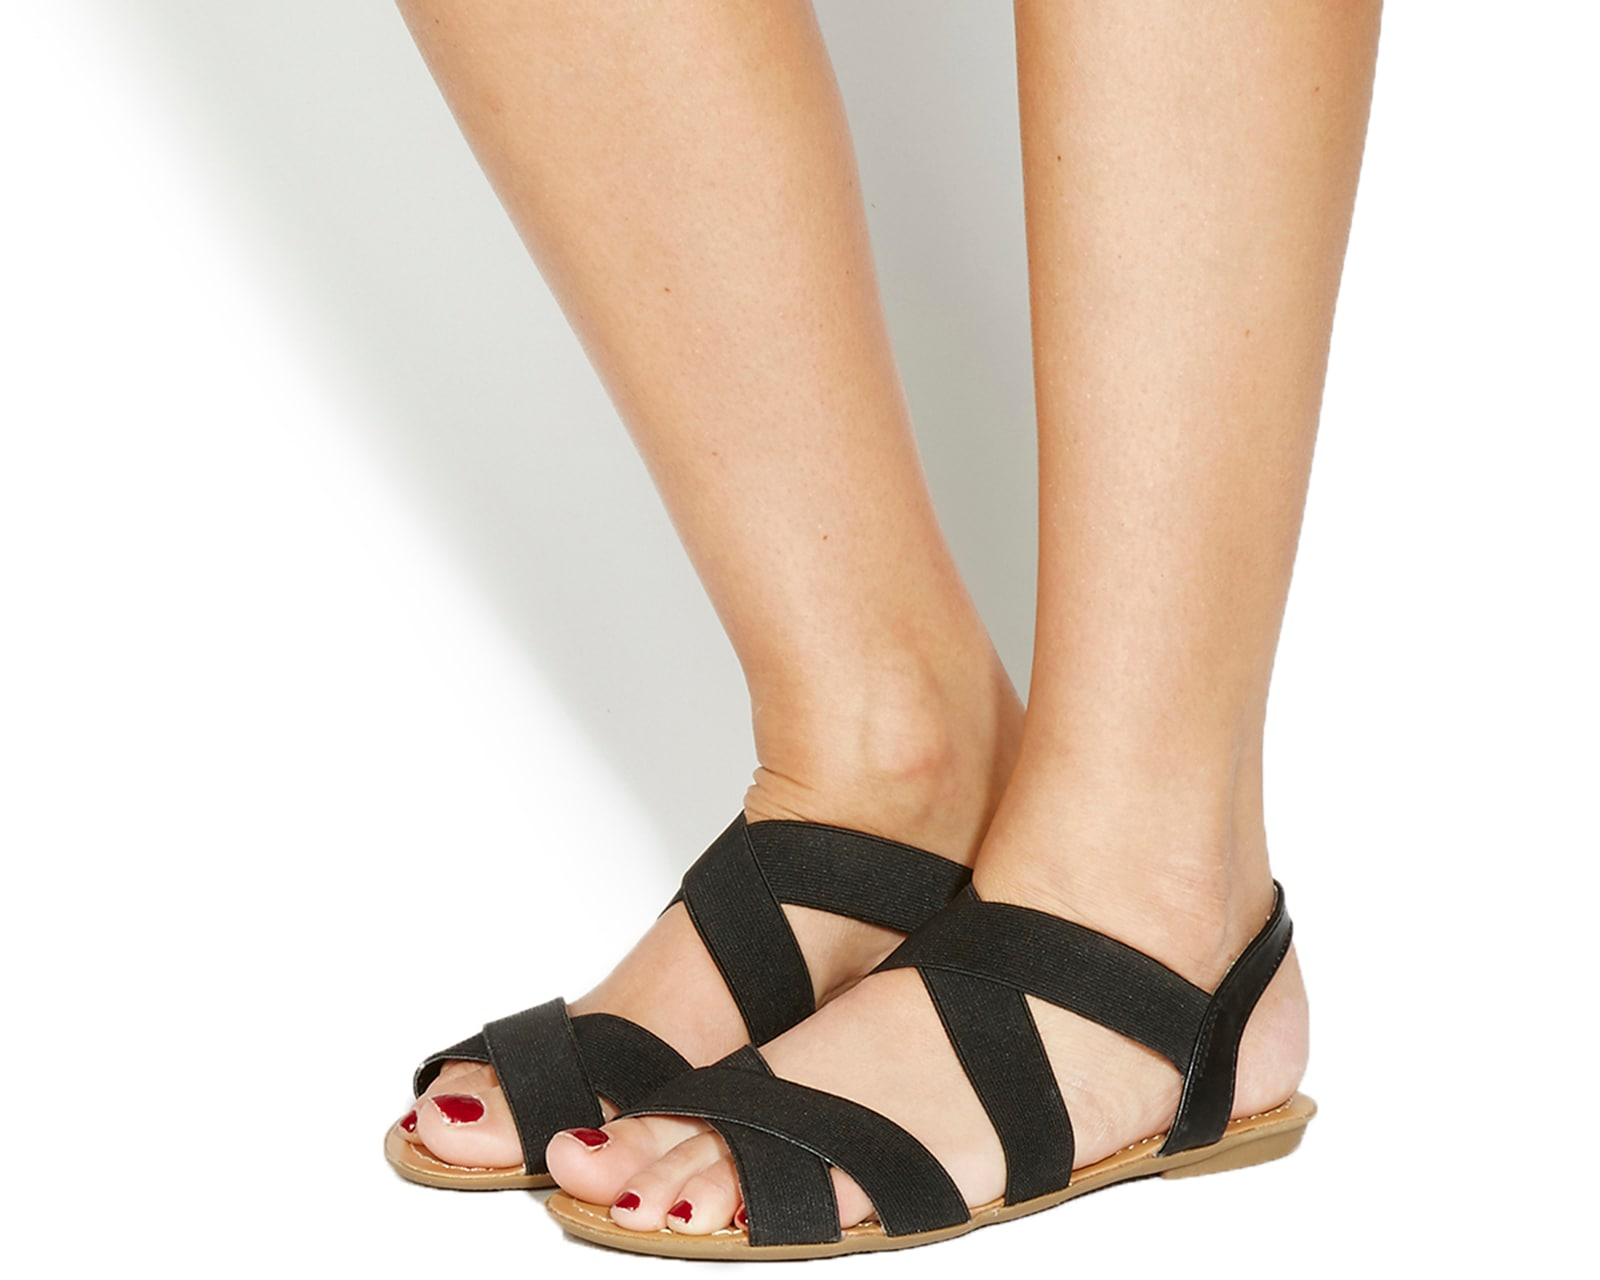 Womens-Office-Bermuda-Elastic-Sandals-BLACK-Sandals